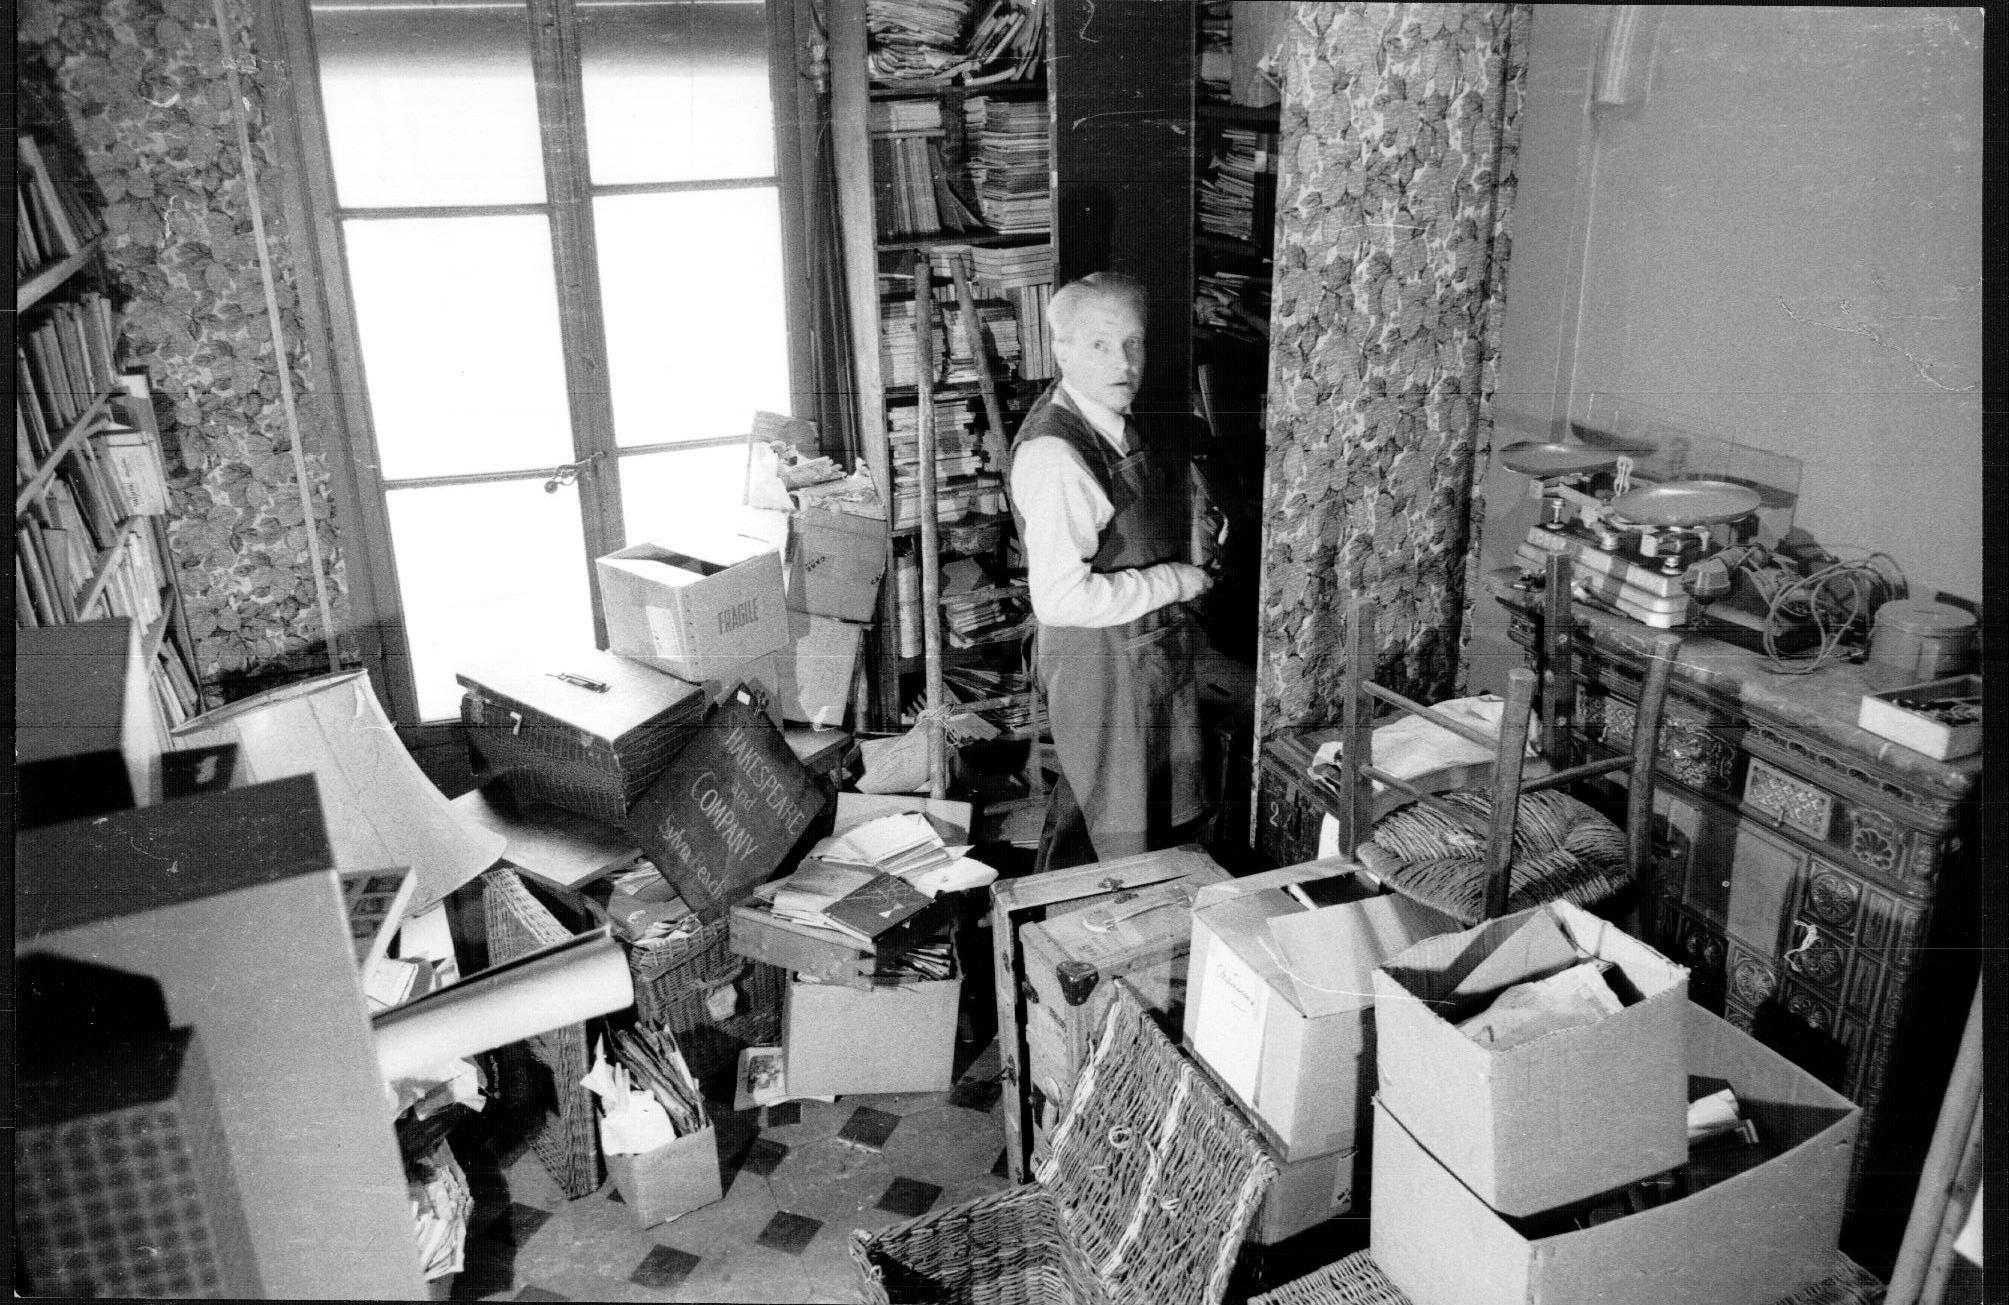 http://blogs.princeton.edu/rarebooks/images/1964-SB-C0108-bx276-1a.jpg